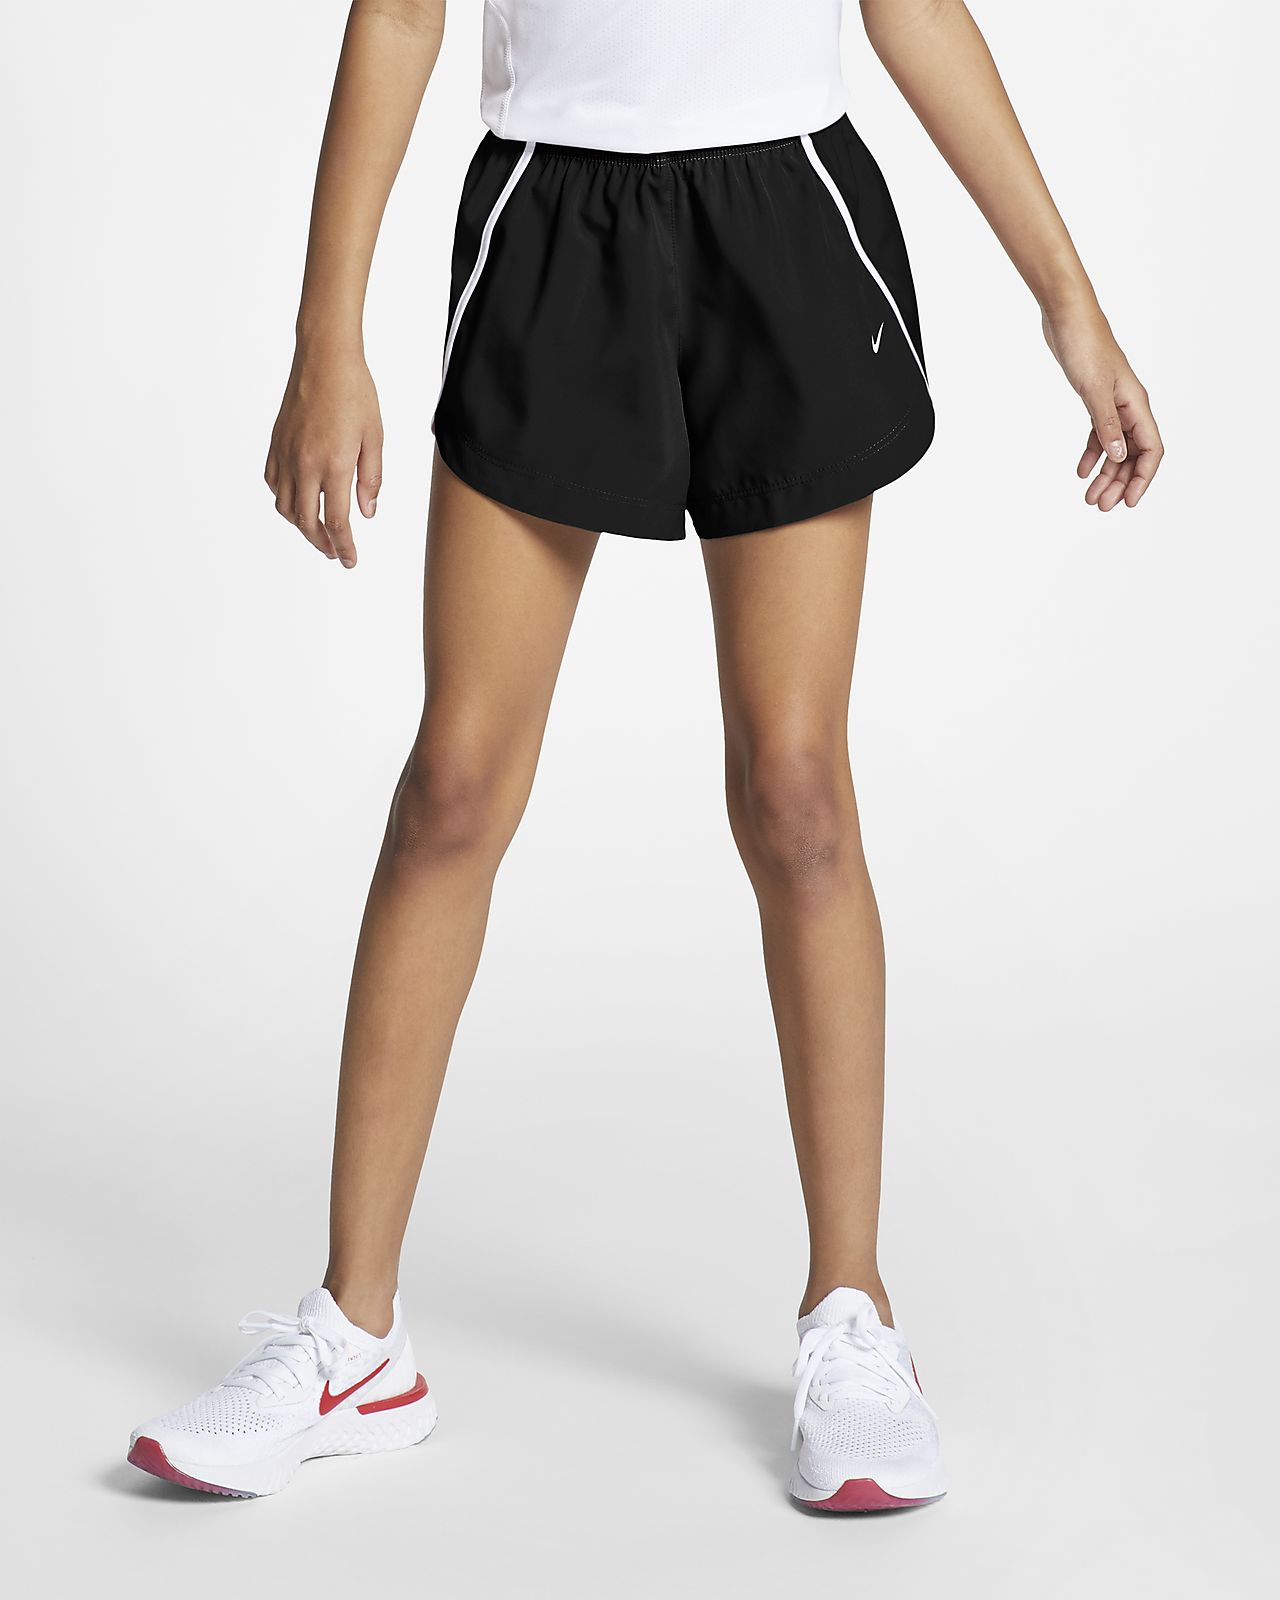 Nike Dry Older Kids' (Girls') Running Shorts